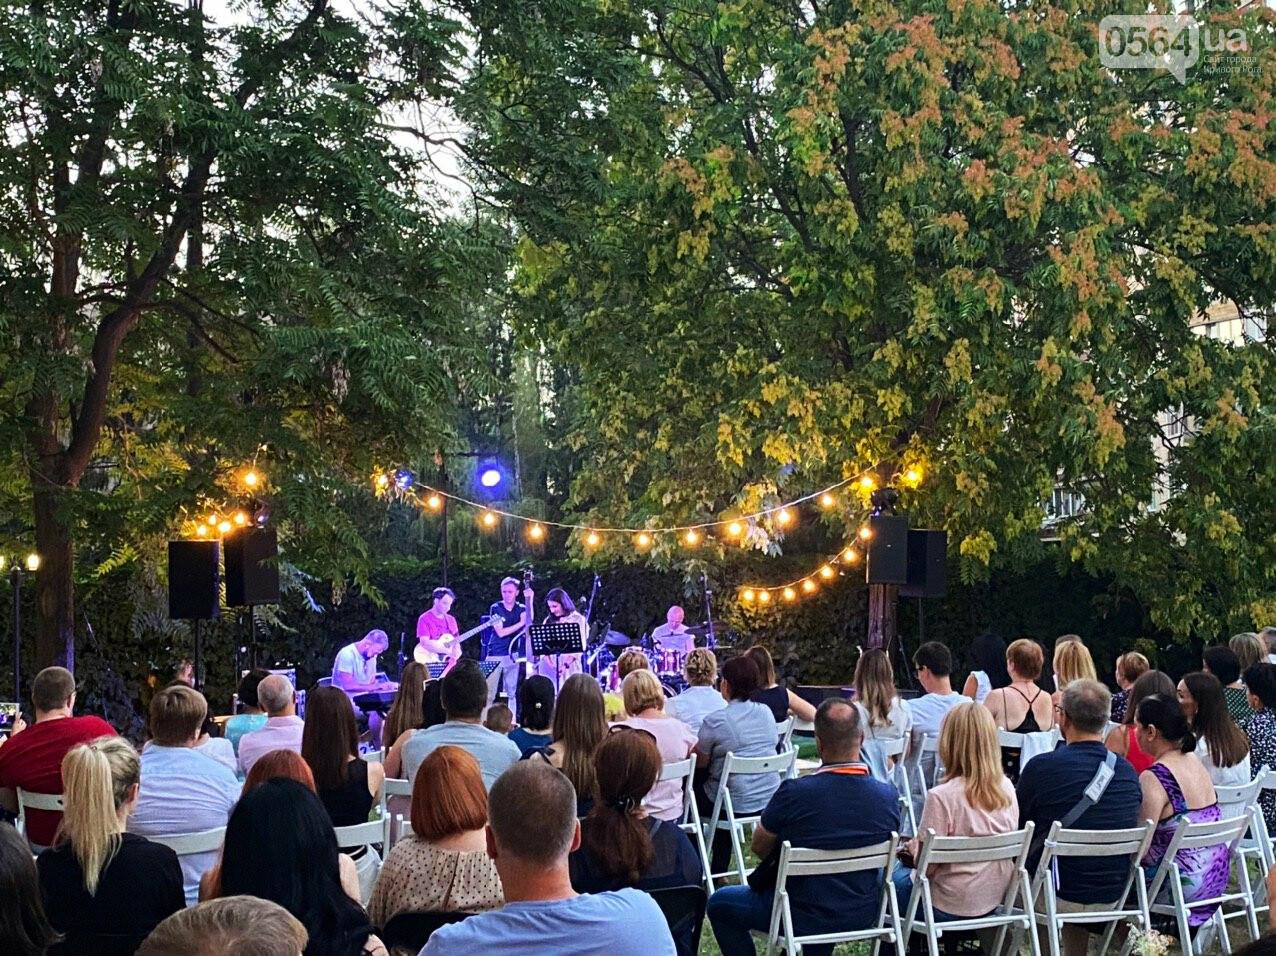 Под звездным небом криворожане наслаждались летним джазом от  Advantage Project, - ФОТО, ВИДЕО , фото-47